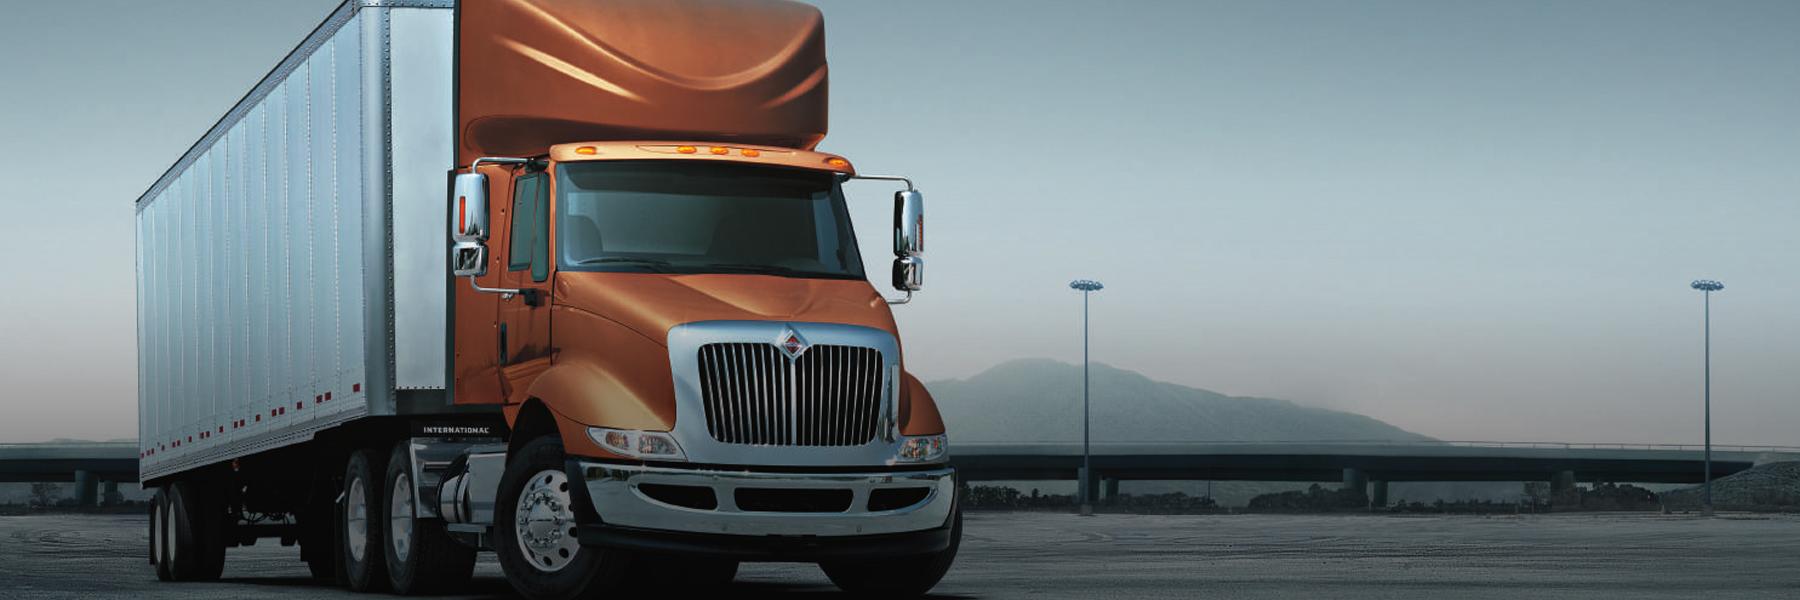 International Brand Truck